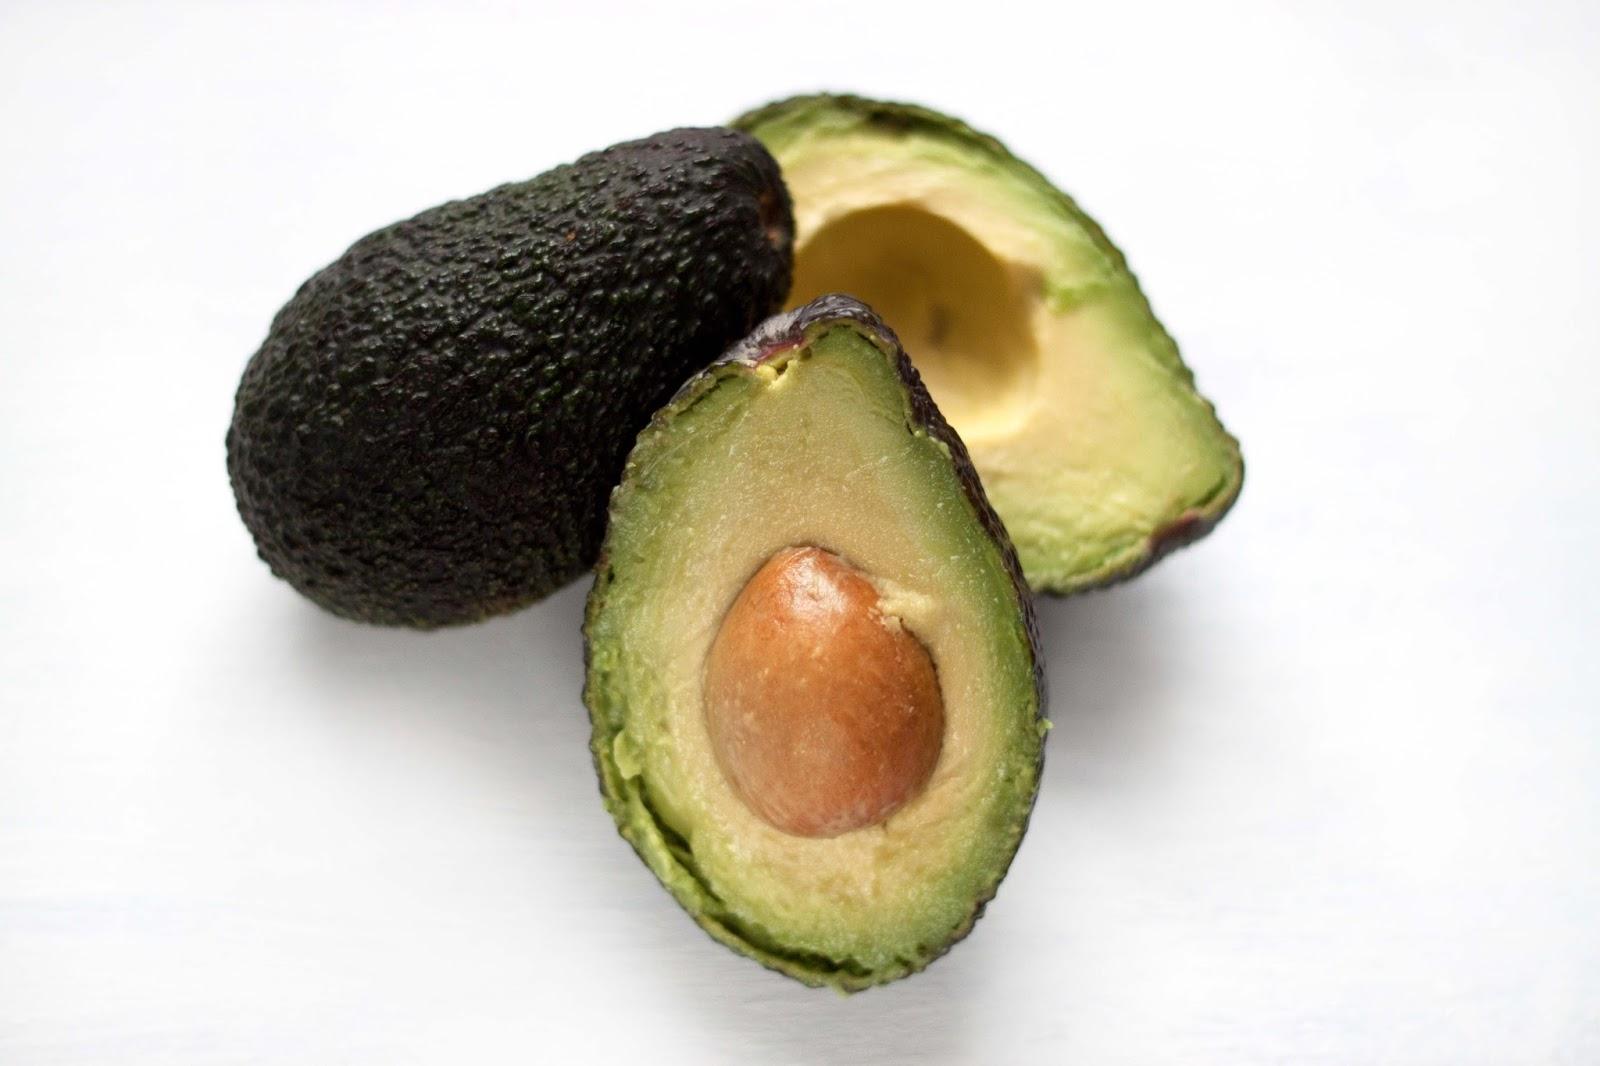 HEALTH BENEFITS OF: AVOCADO